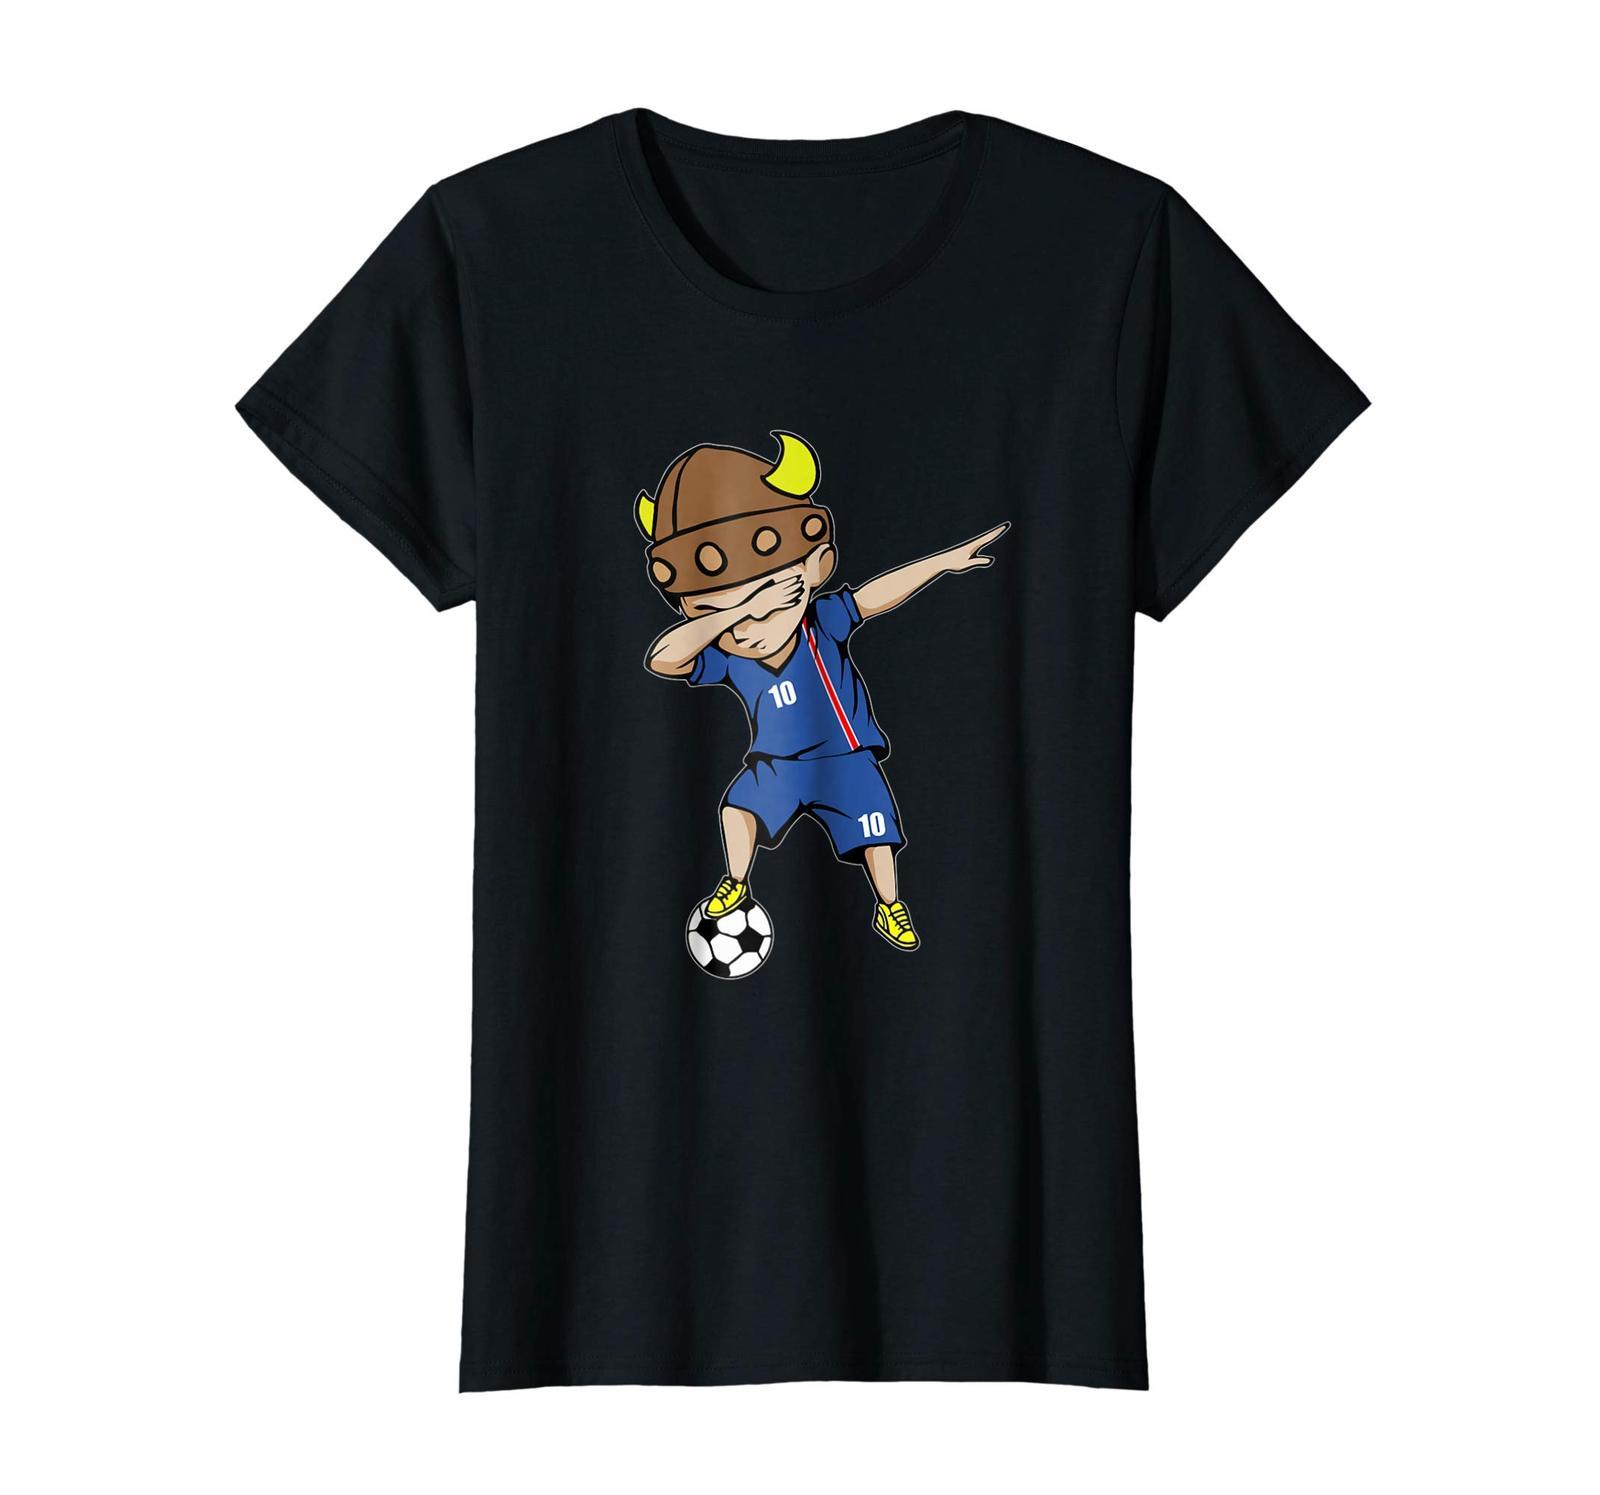 Sport Shirts - Dabbing Soccer Boy Iceland Jersey T-Shirt - Number 10 Tees Wowen